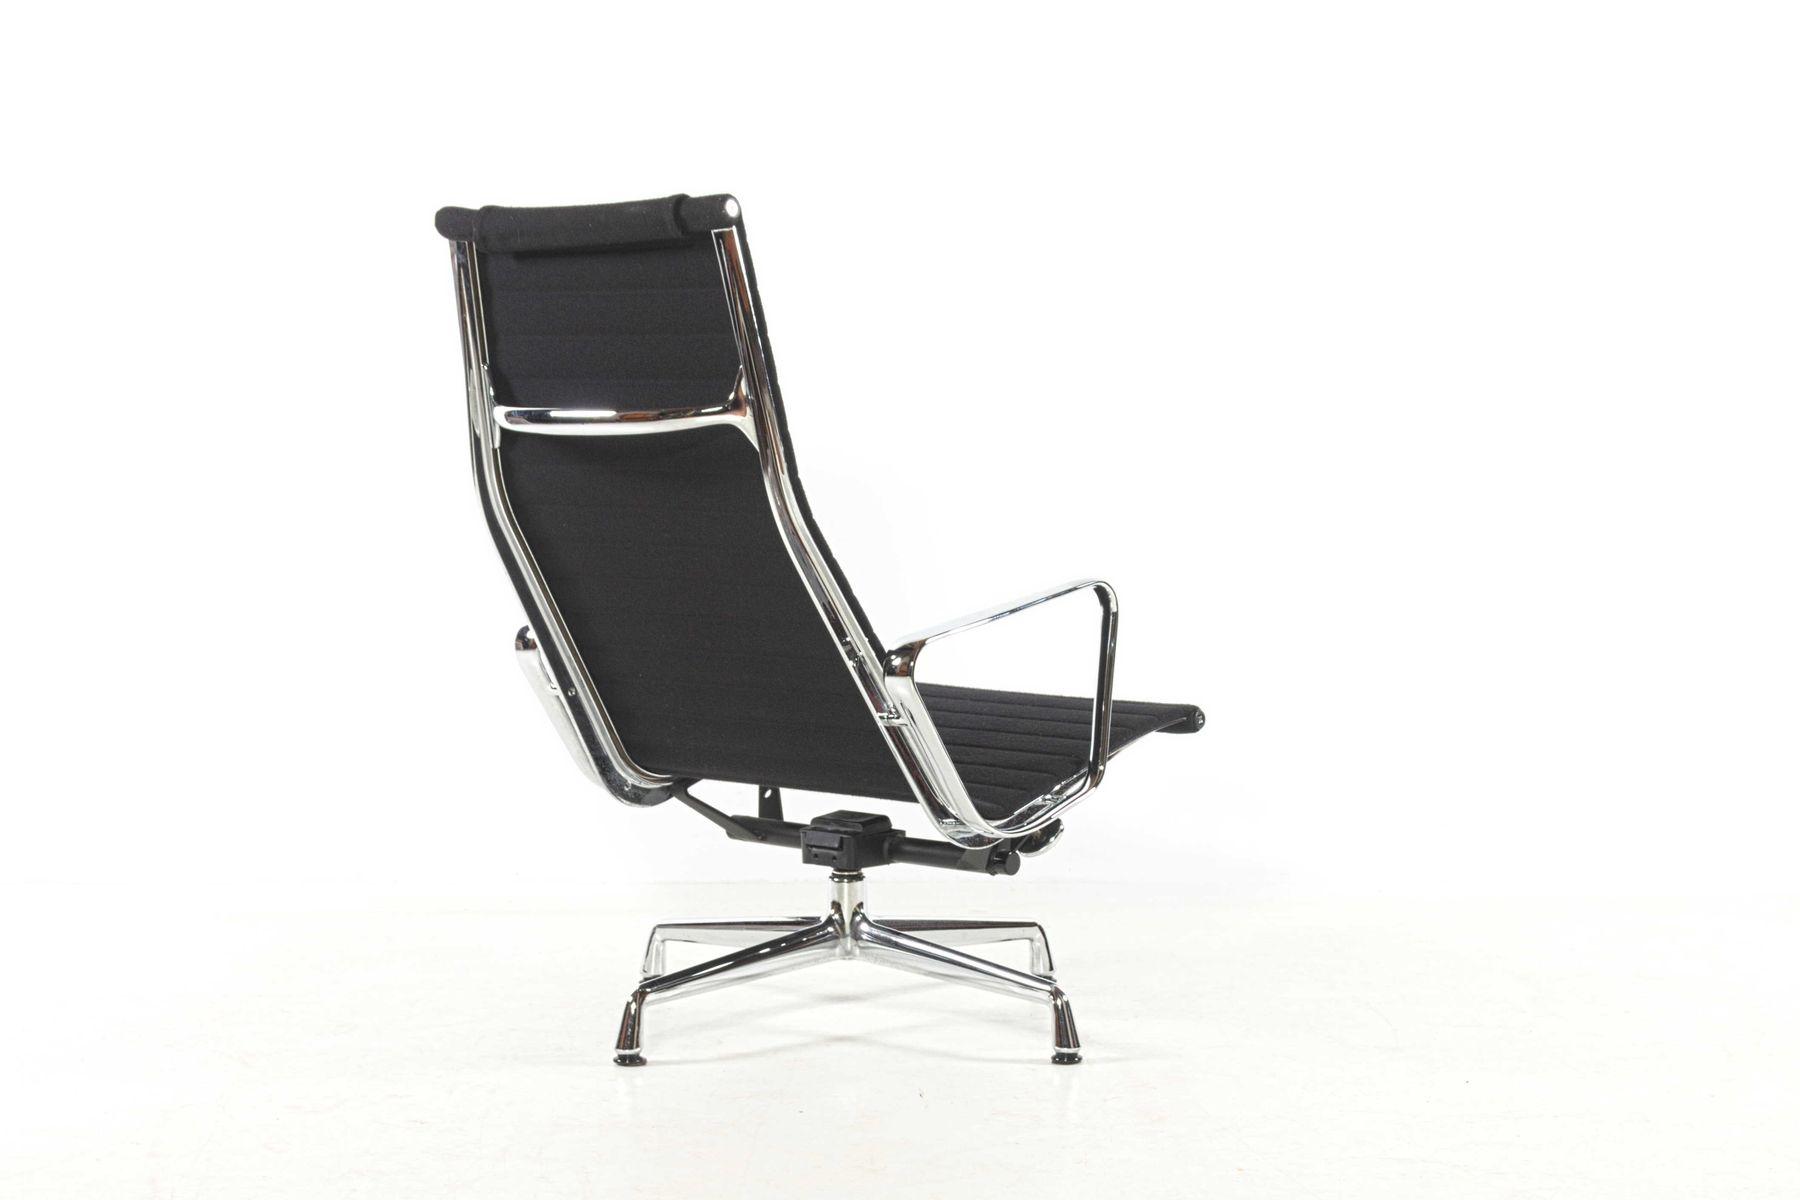 mid century ea124 sessel von charles ray eames f r vitra bei pamono kaufen. Black Bedroom Furniture Sets. Home Design Ideas